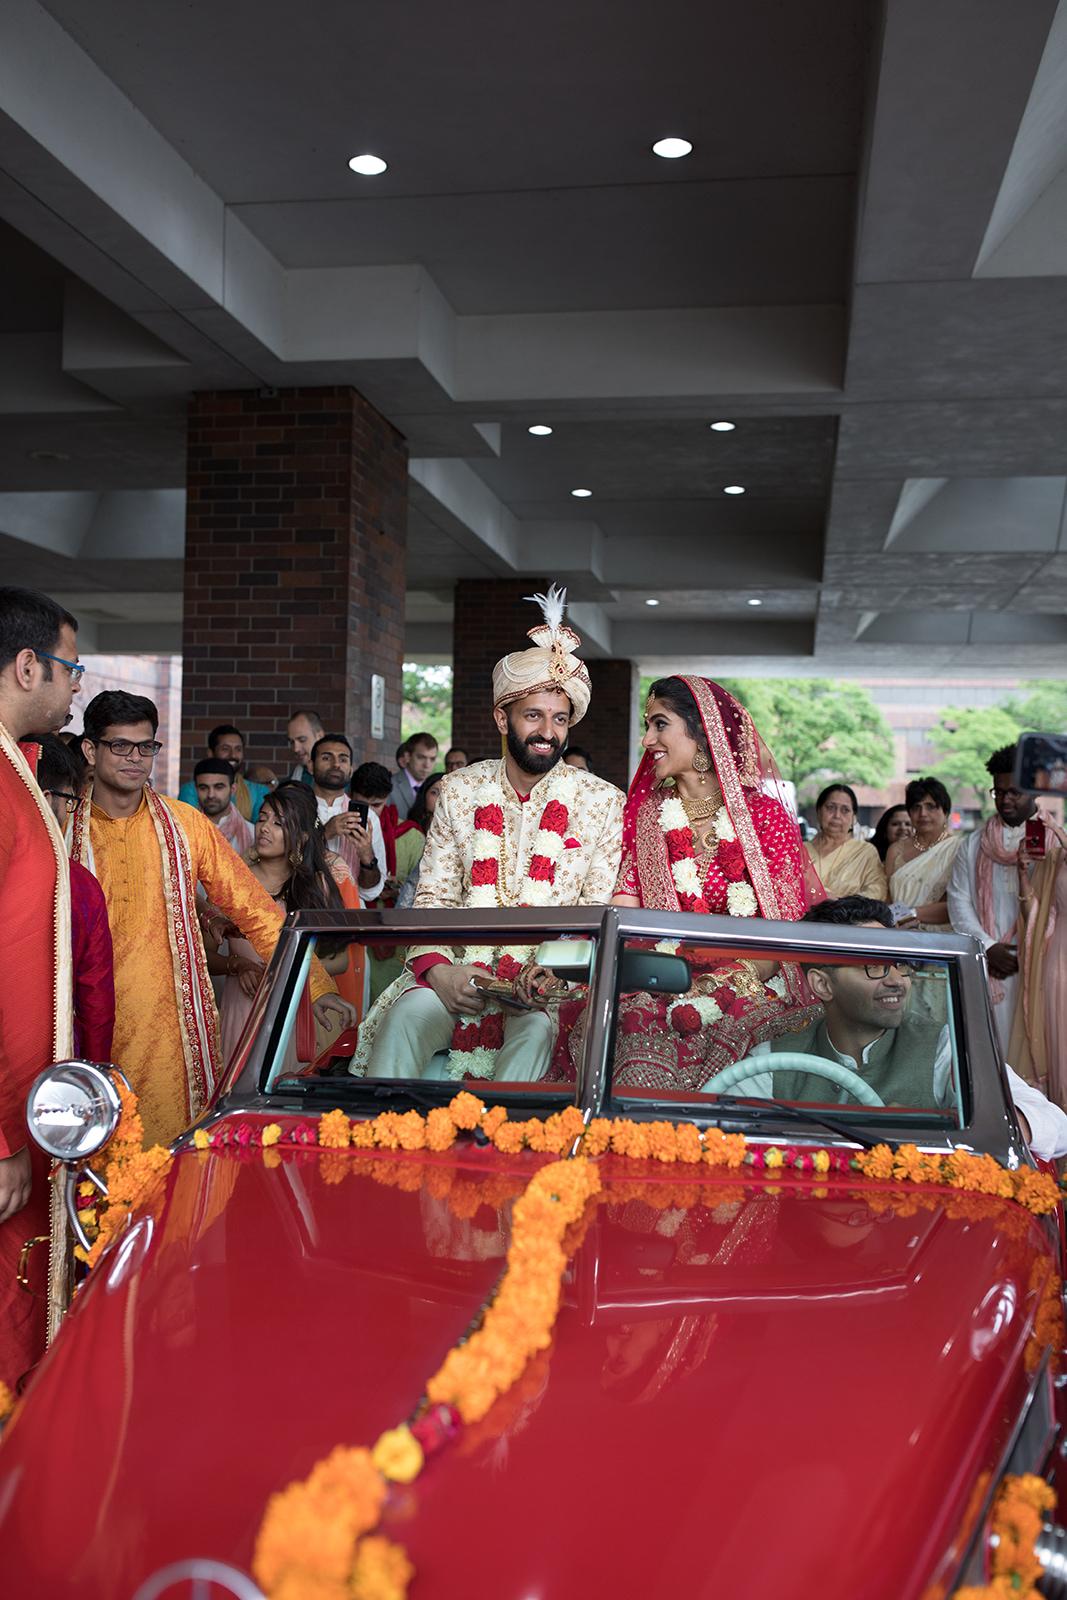 Le Cape Weddings - Sumeet and Chavi - Vidai --38.jpg